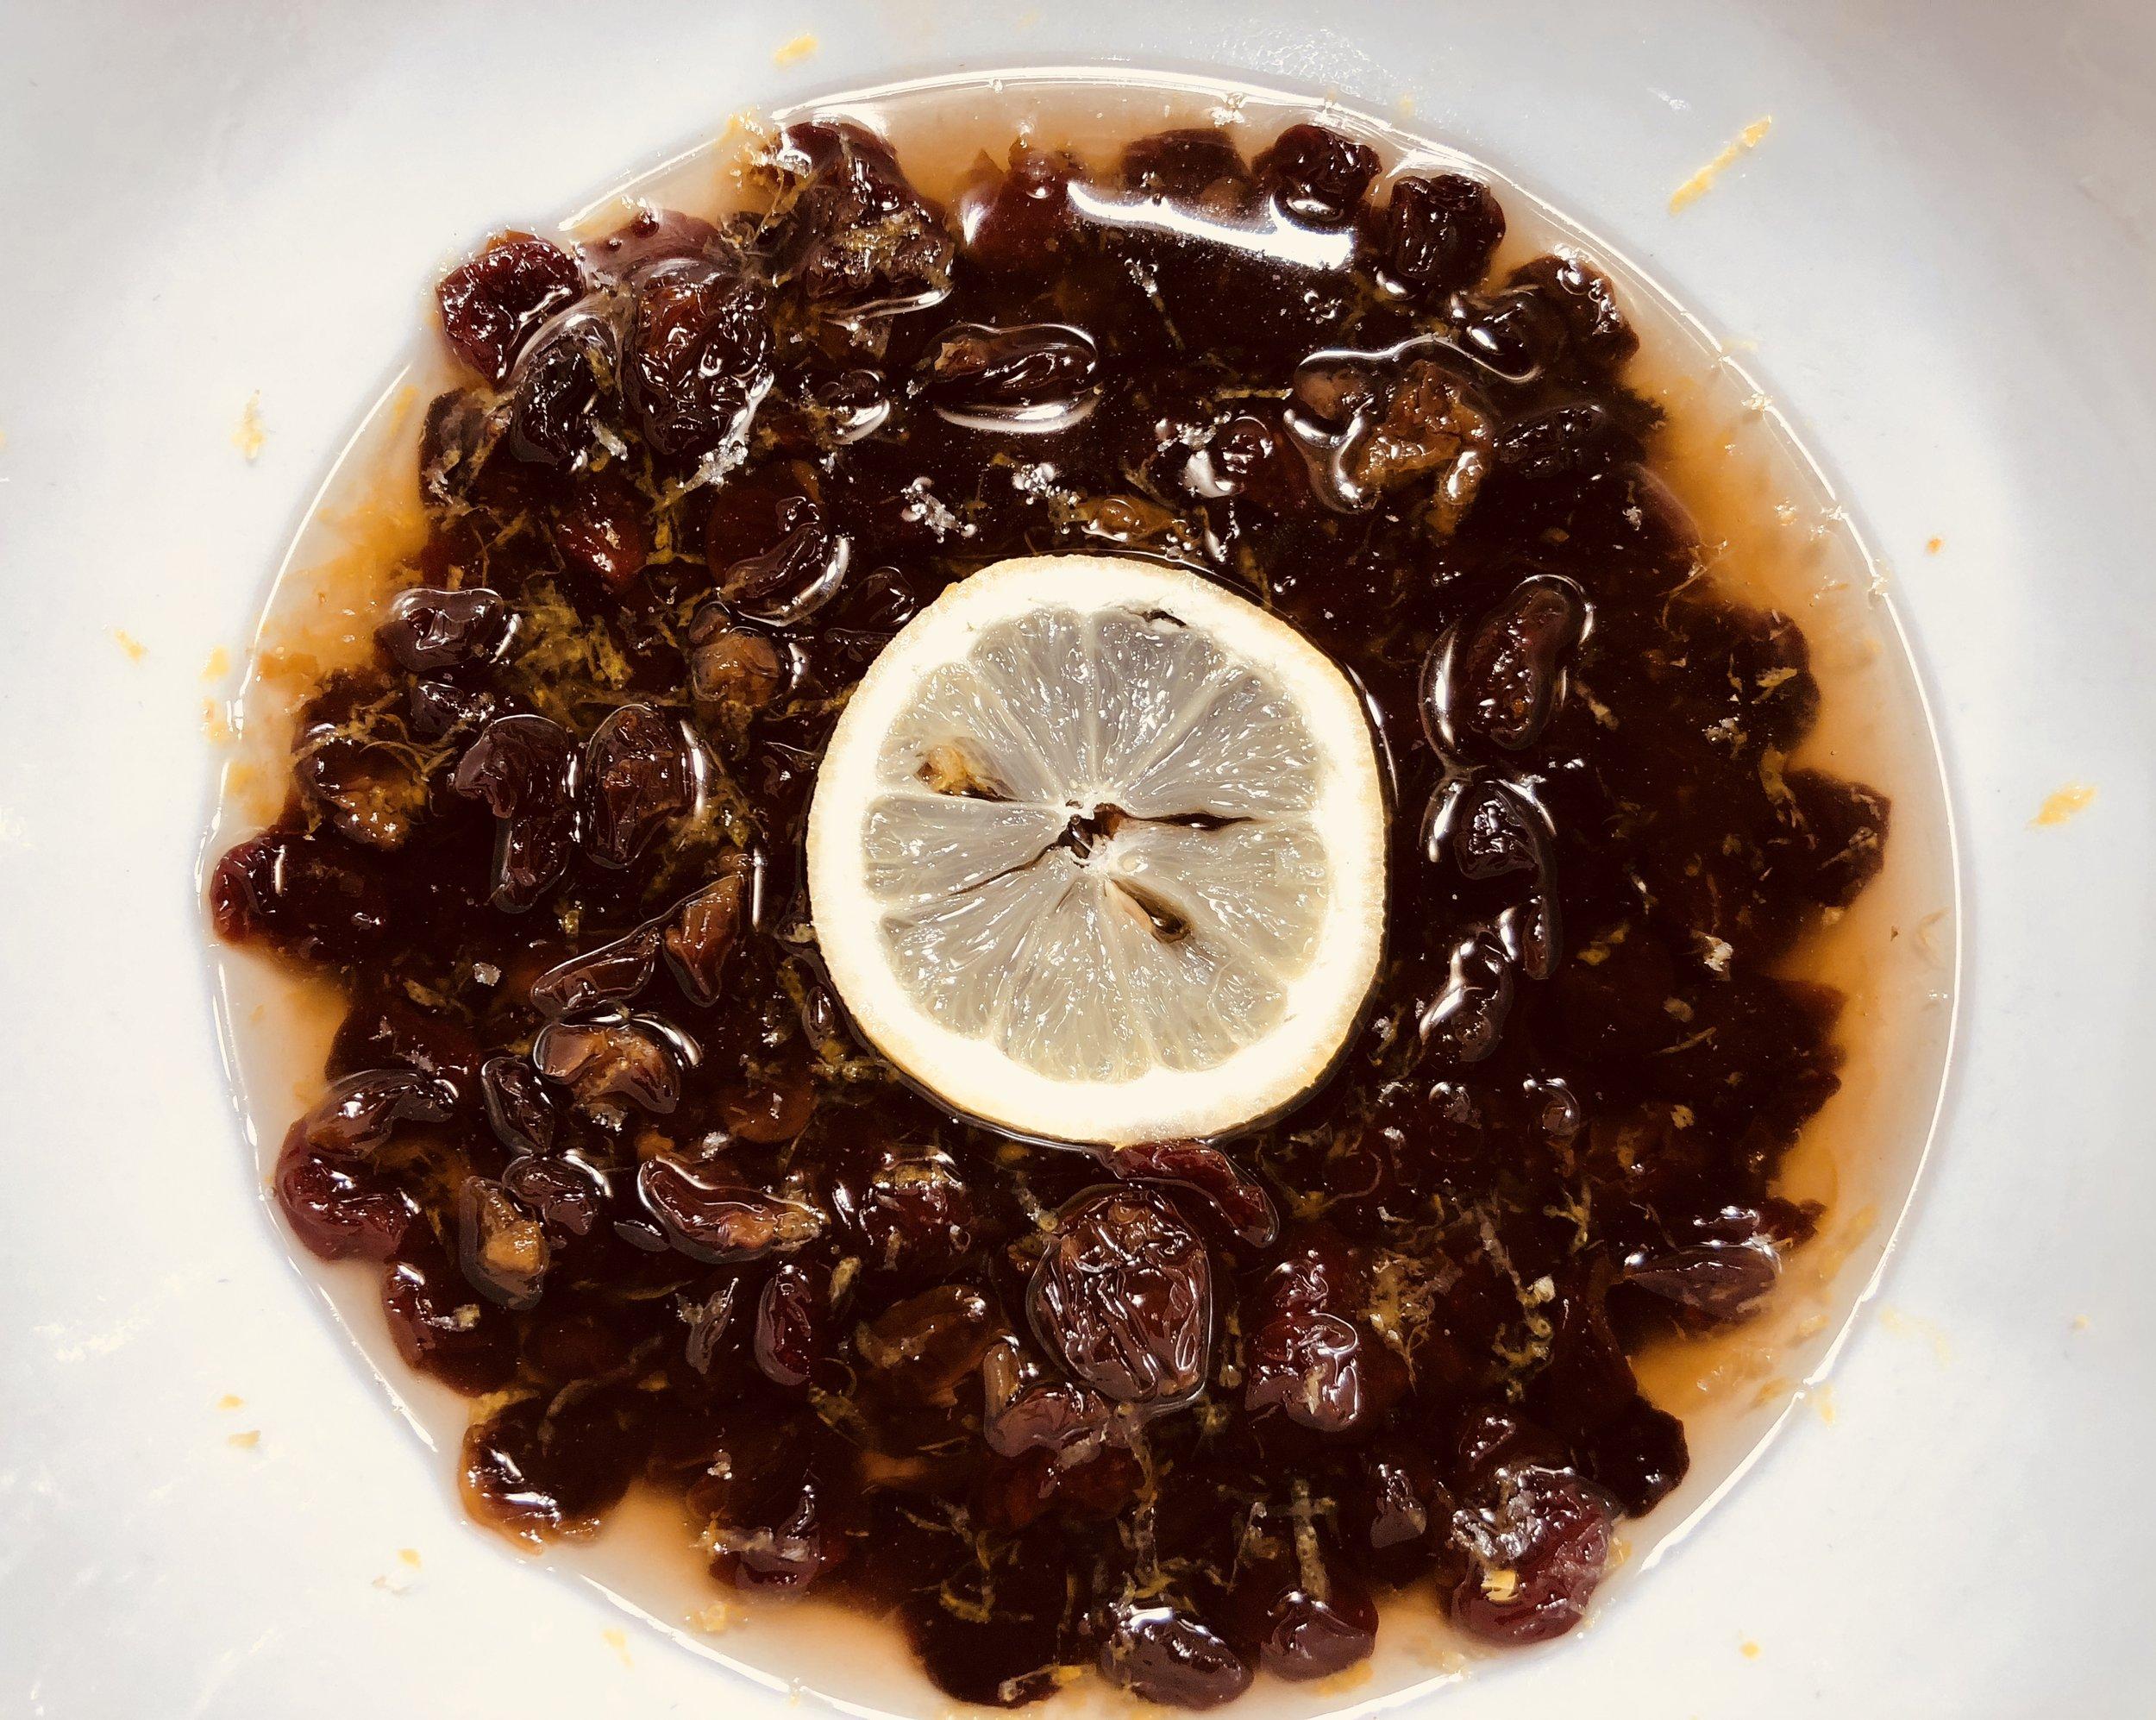 Marinating the dried cherries with lemon zest, vanilla, and sugar.